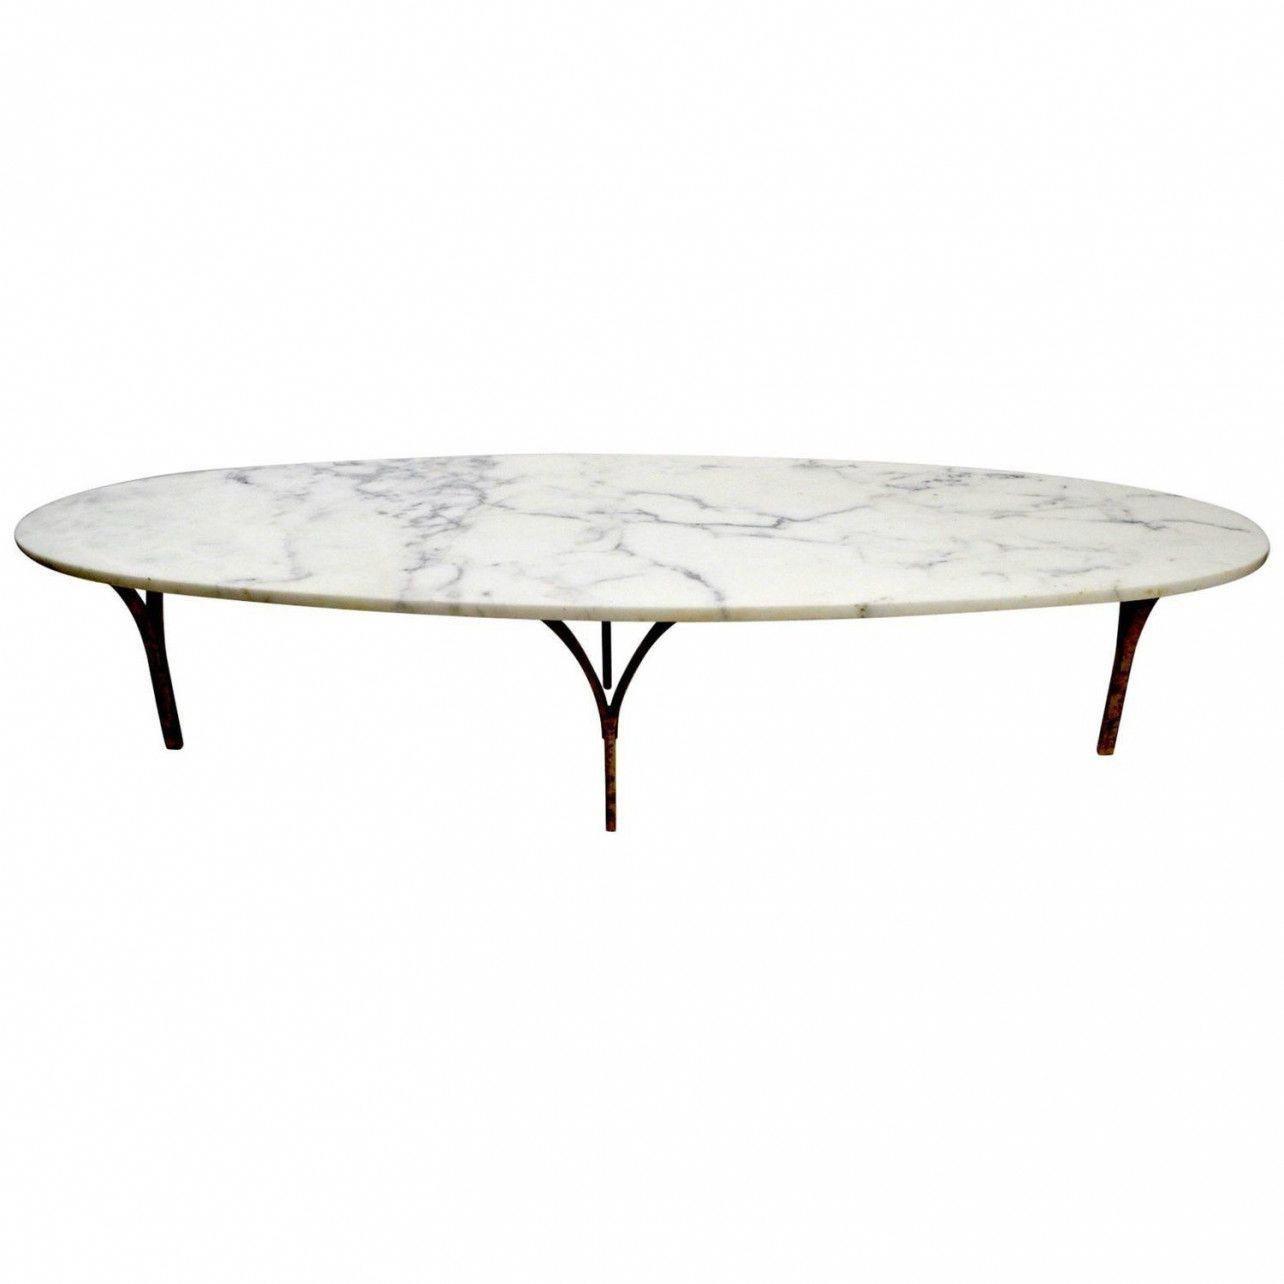 Cheap Coffee Shops Near Me Coffeebeans Marble Top Coffee Table Acrylic Coffee Table Marble Coffee Table [ 1284 x 1284 Pixel ]